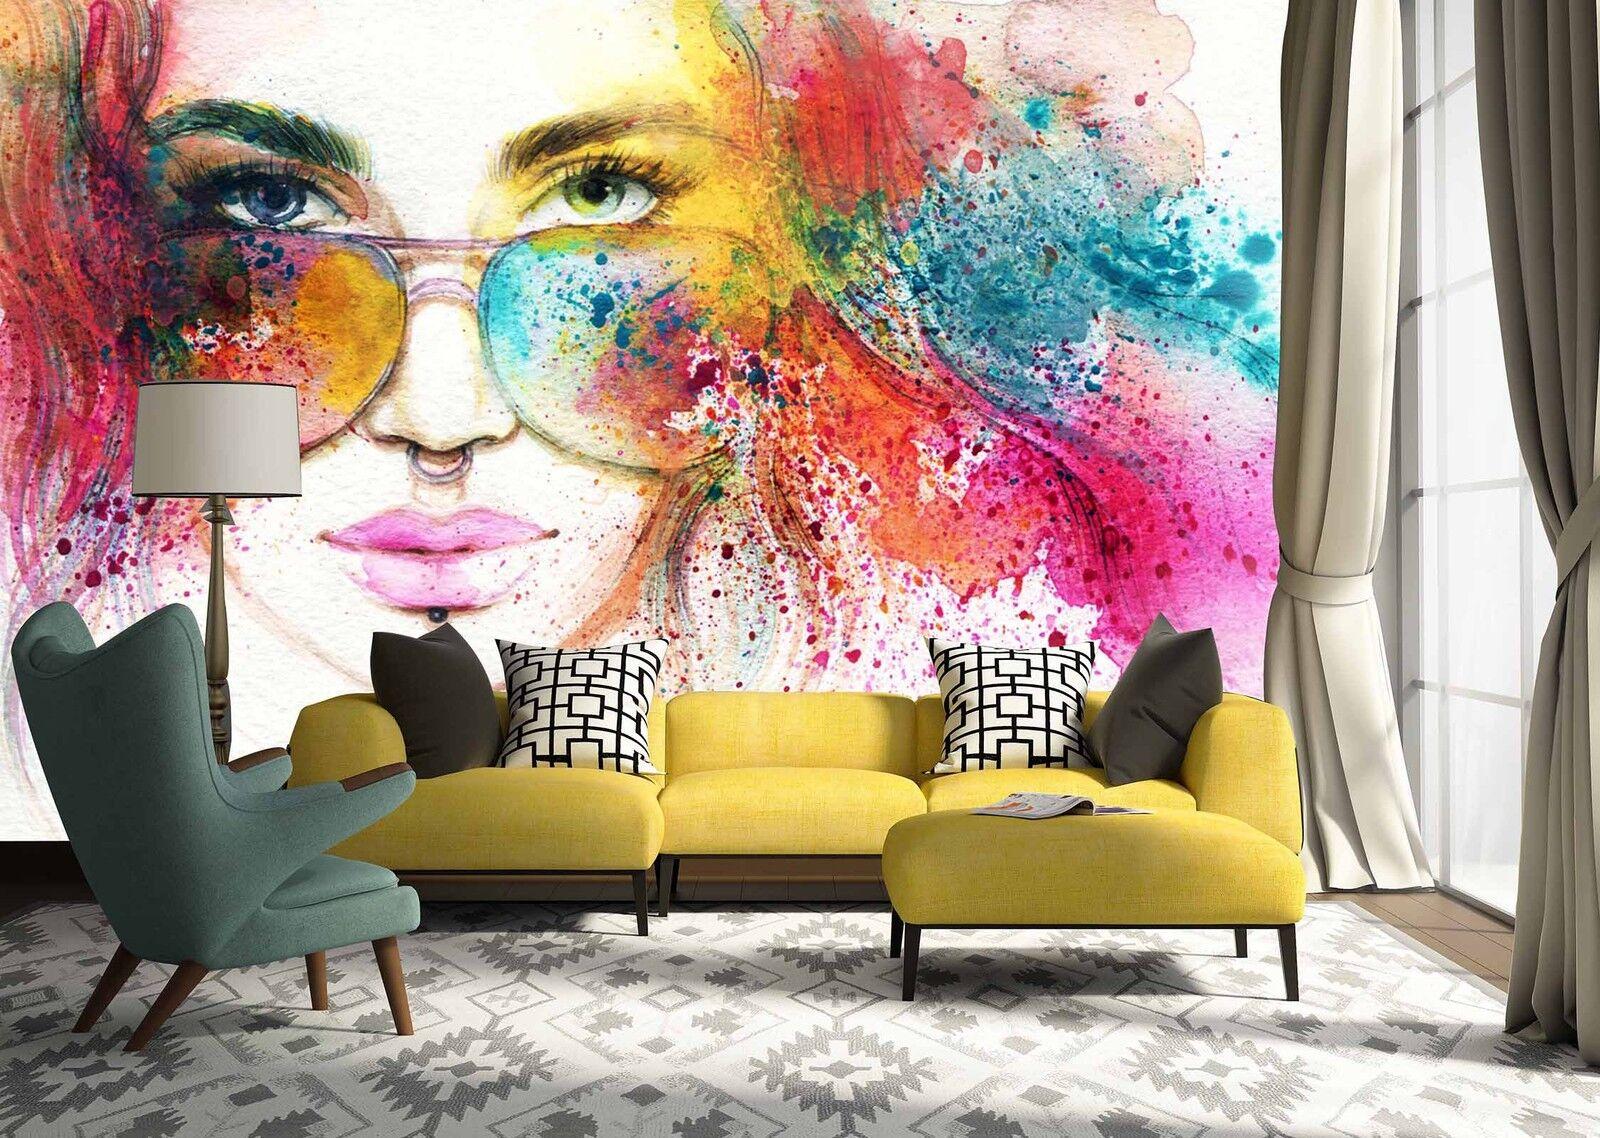 3D Frauen Videos 365 Fototapeten Wandbild Fototapete Bild Tapete Familie